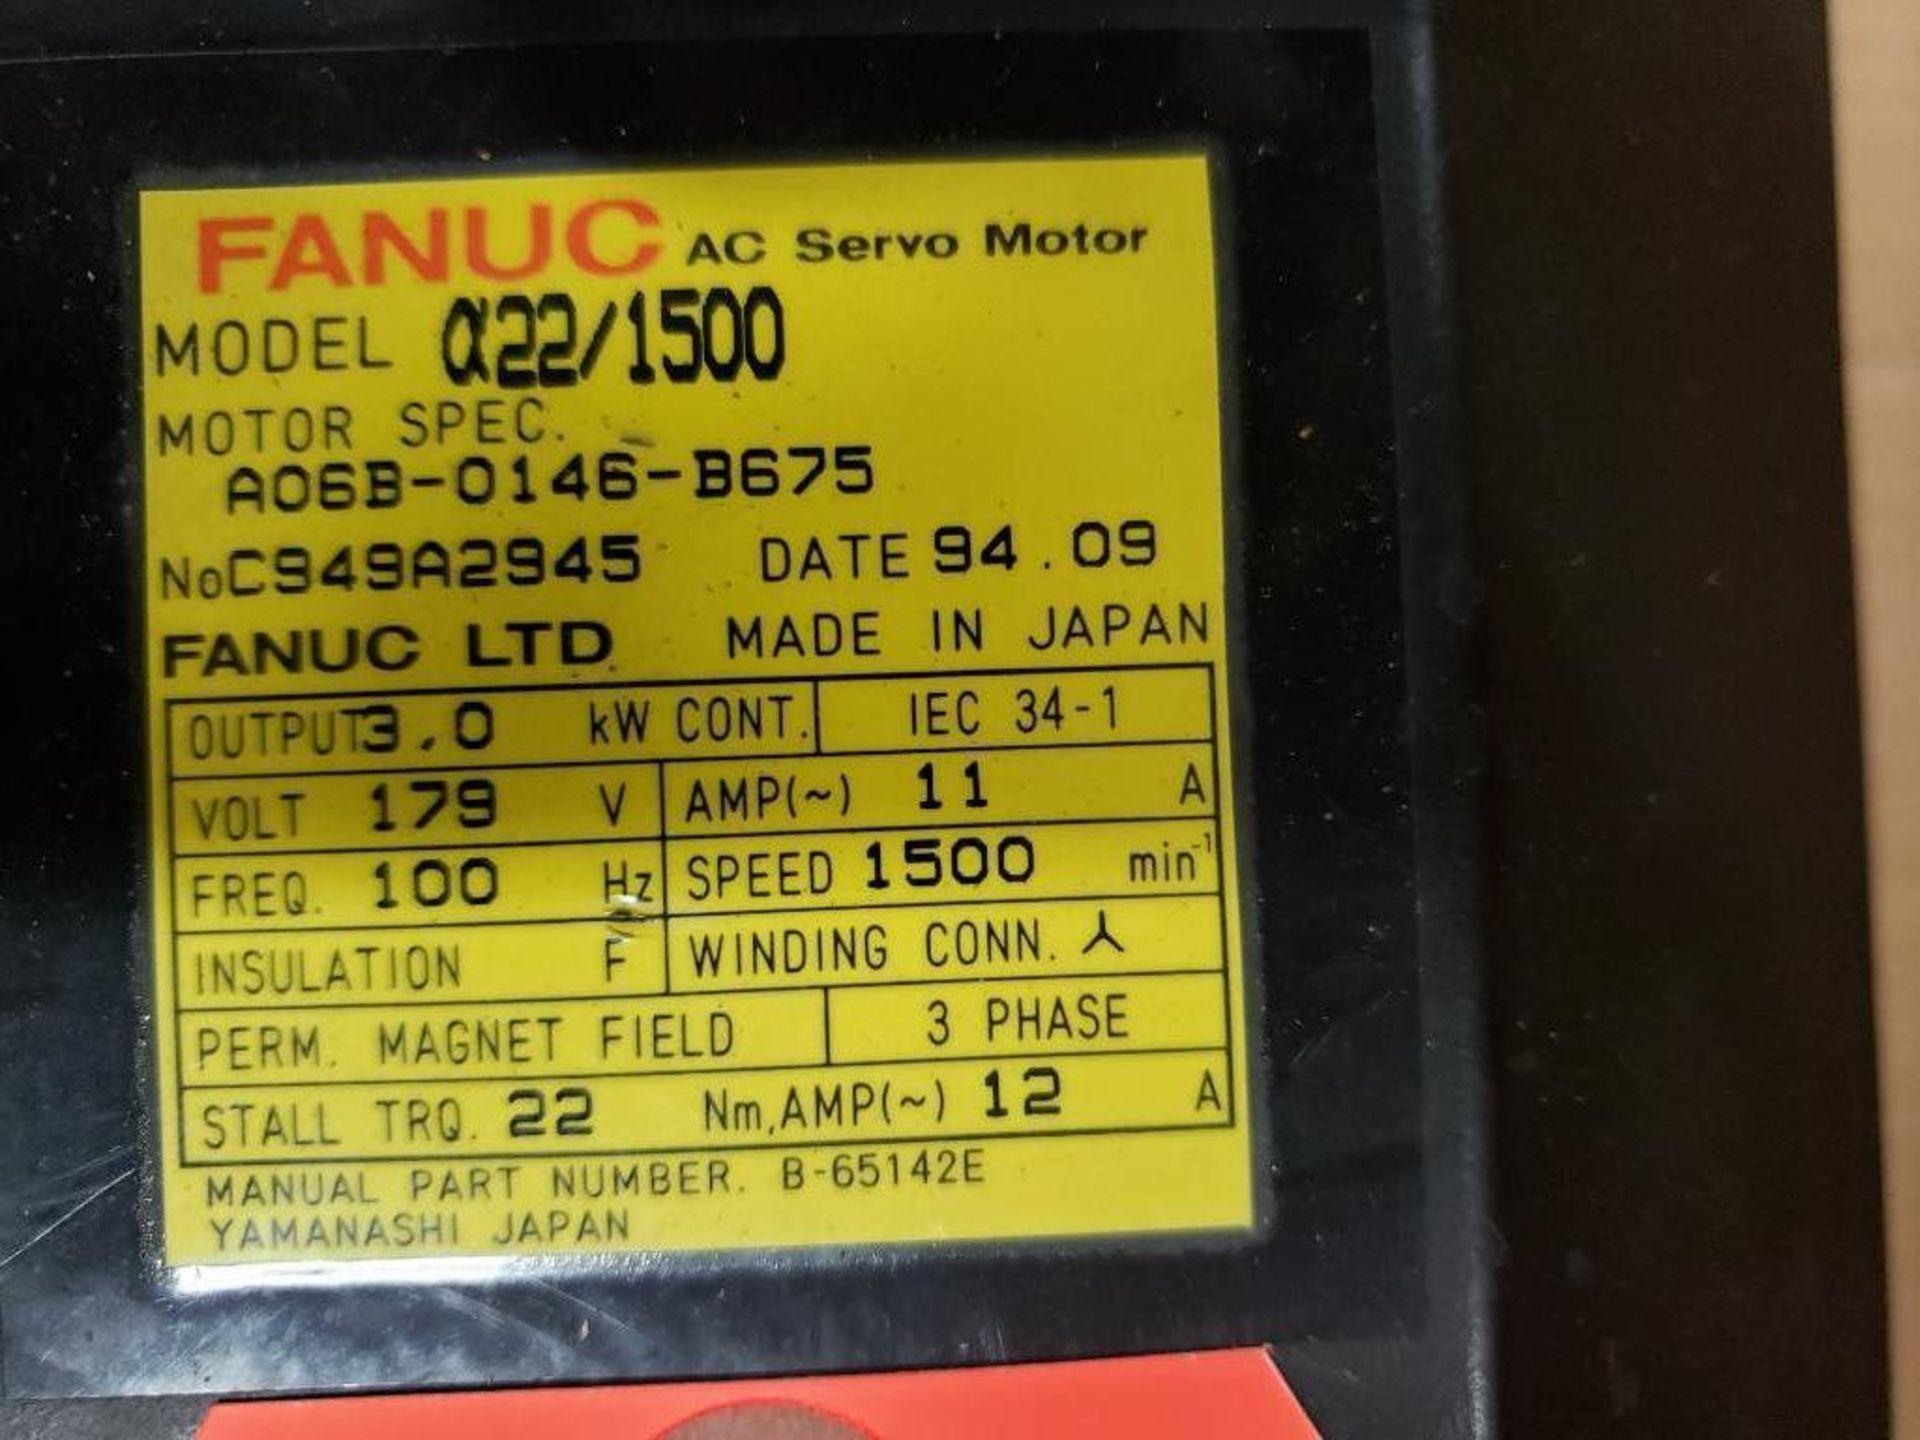 3.0kW GE Fanuc AC Servo Motor A06B-0146-B675. 179V, 1500RPM, 3PH. - Image 2 of 6